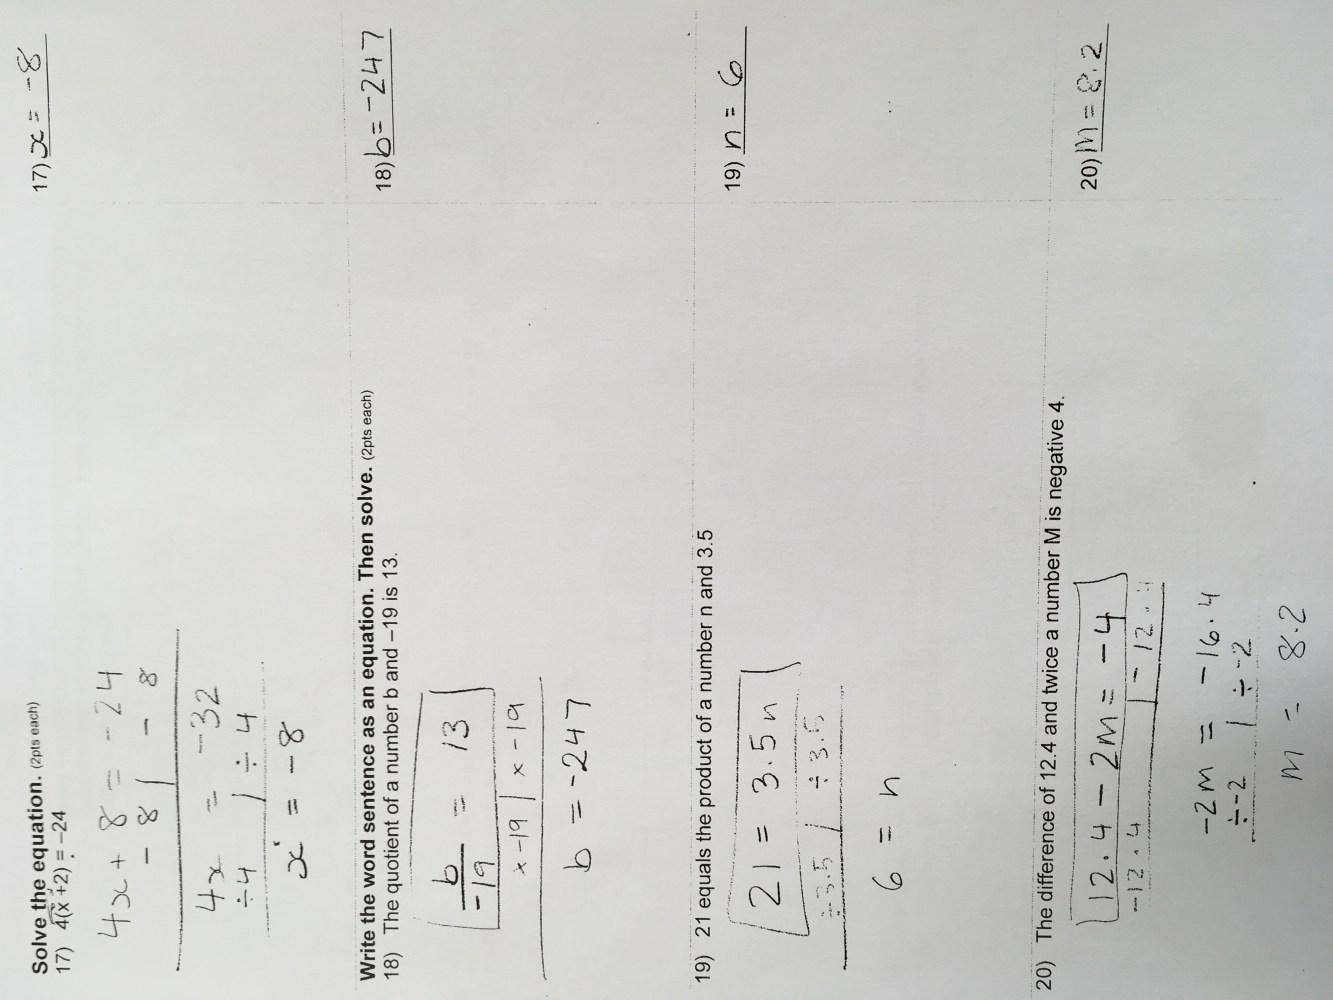 medium resolution of Homework Archives - Page 25 of 70 - Grades 7 \u0026 8/ Middle School Math